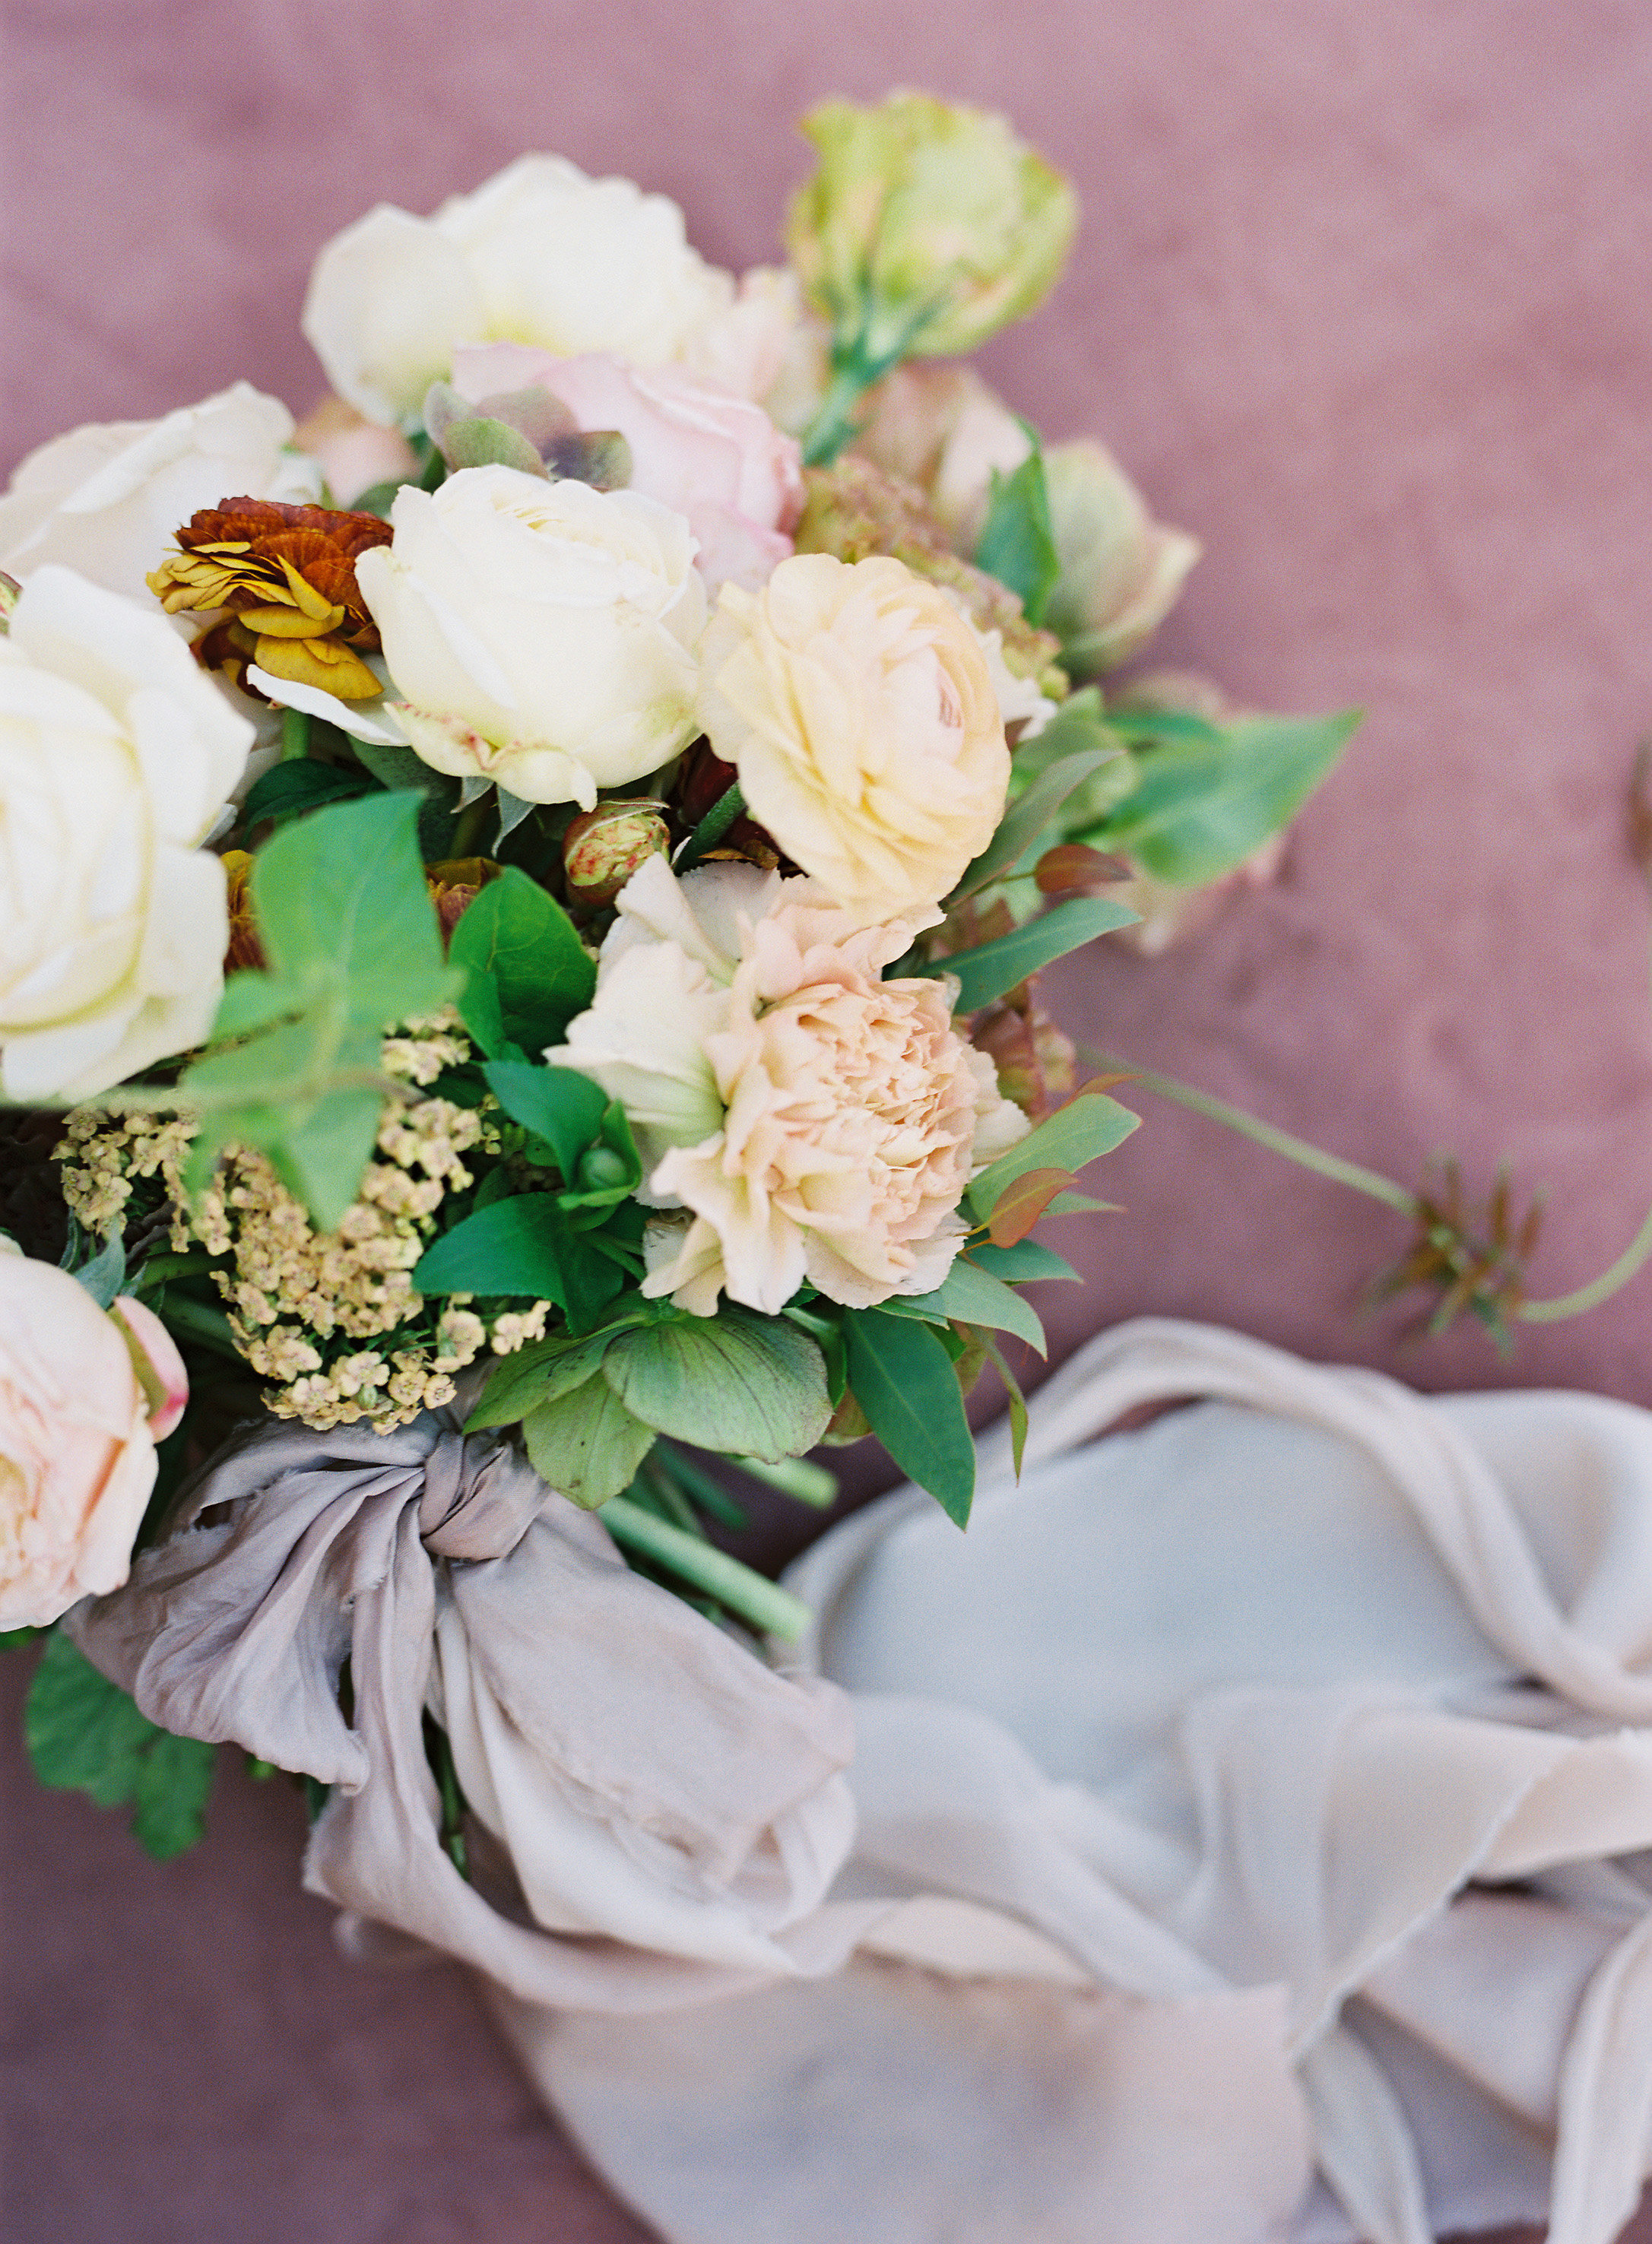 jessica-zimmerman-events-arkansas-mountain-wedding-bouquet.jpg